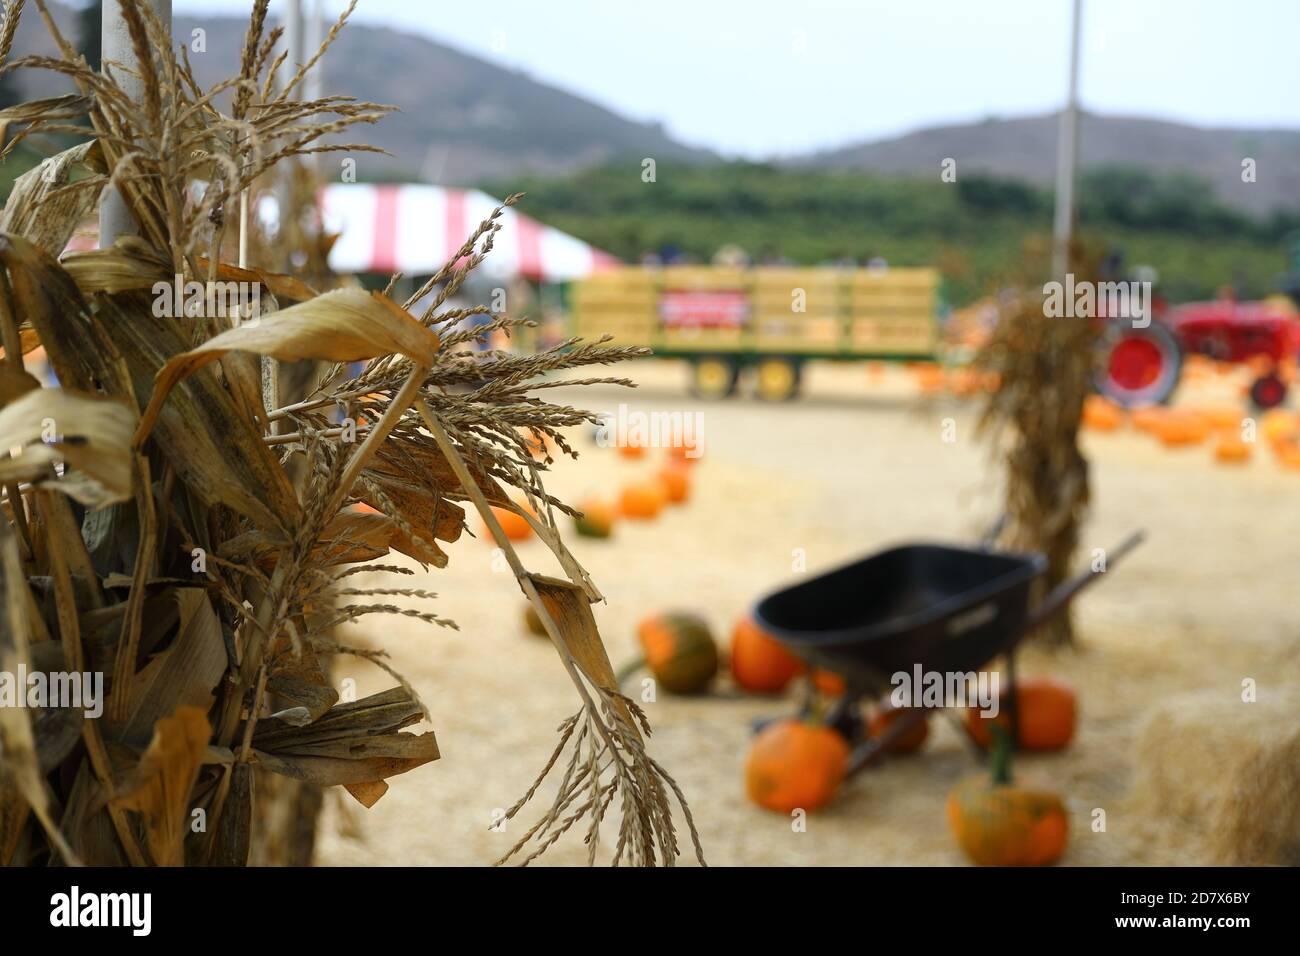 Underwood Farms Fall Festival Pumpkins 2020 Stock Photo